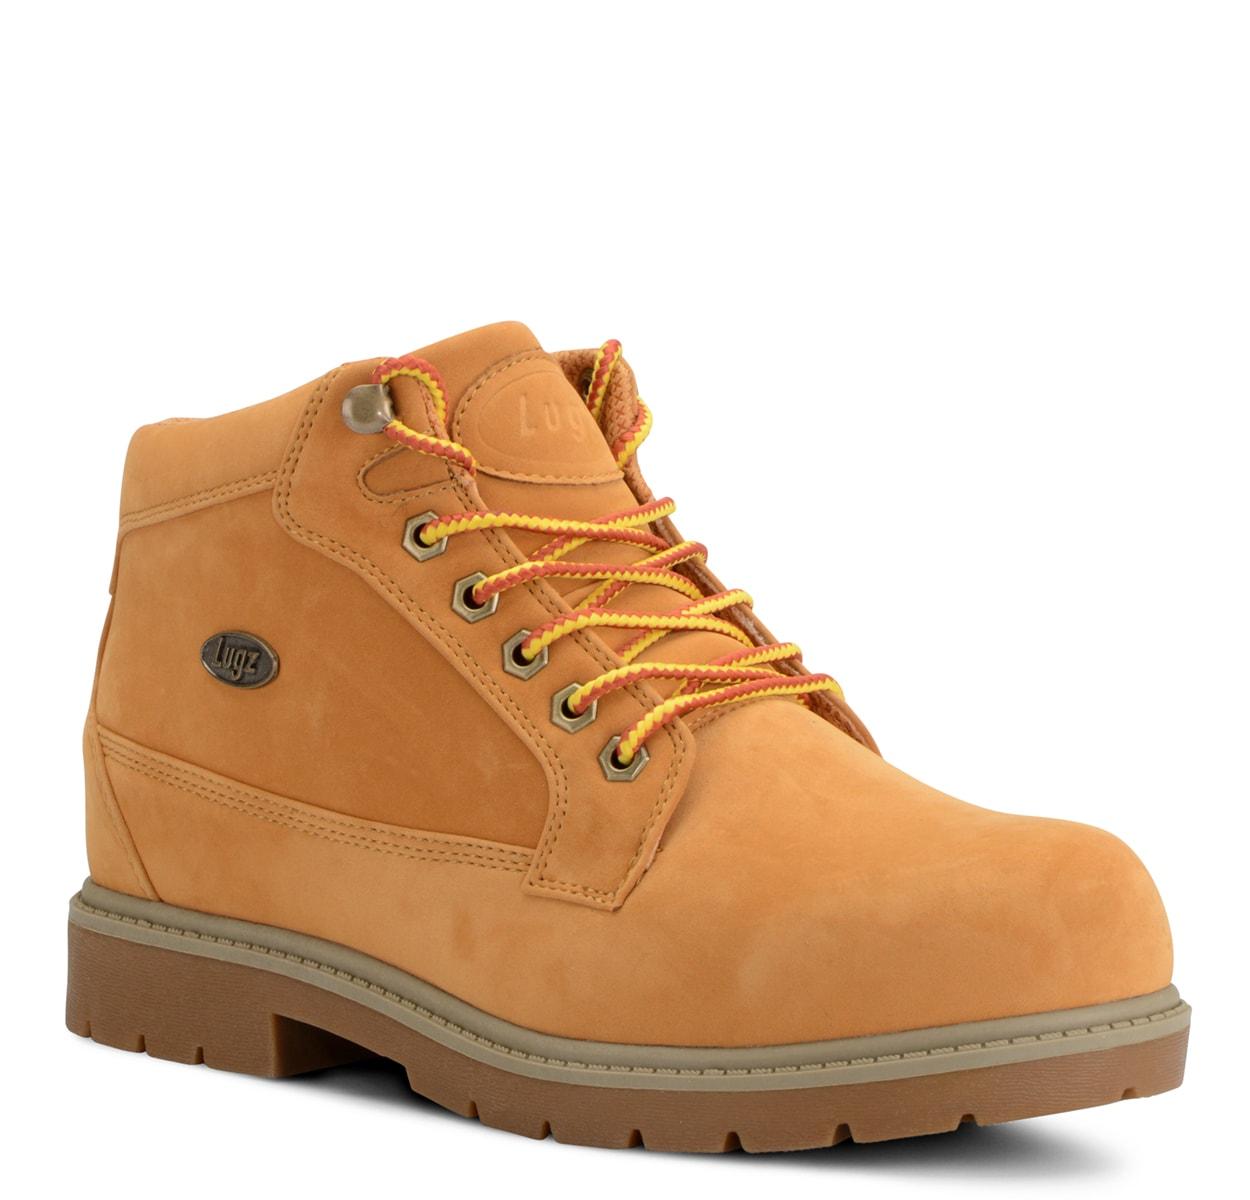 Men's Mantle Mid Chukka Boot (Choose Your Color: GOLDEN WHEAT/TAN-KHAKI/GUM, Choose Your Size: 9.5)